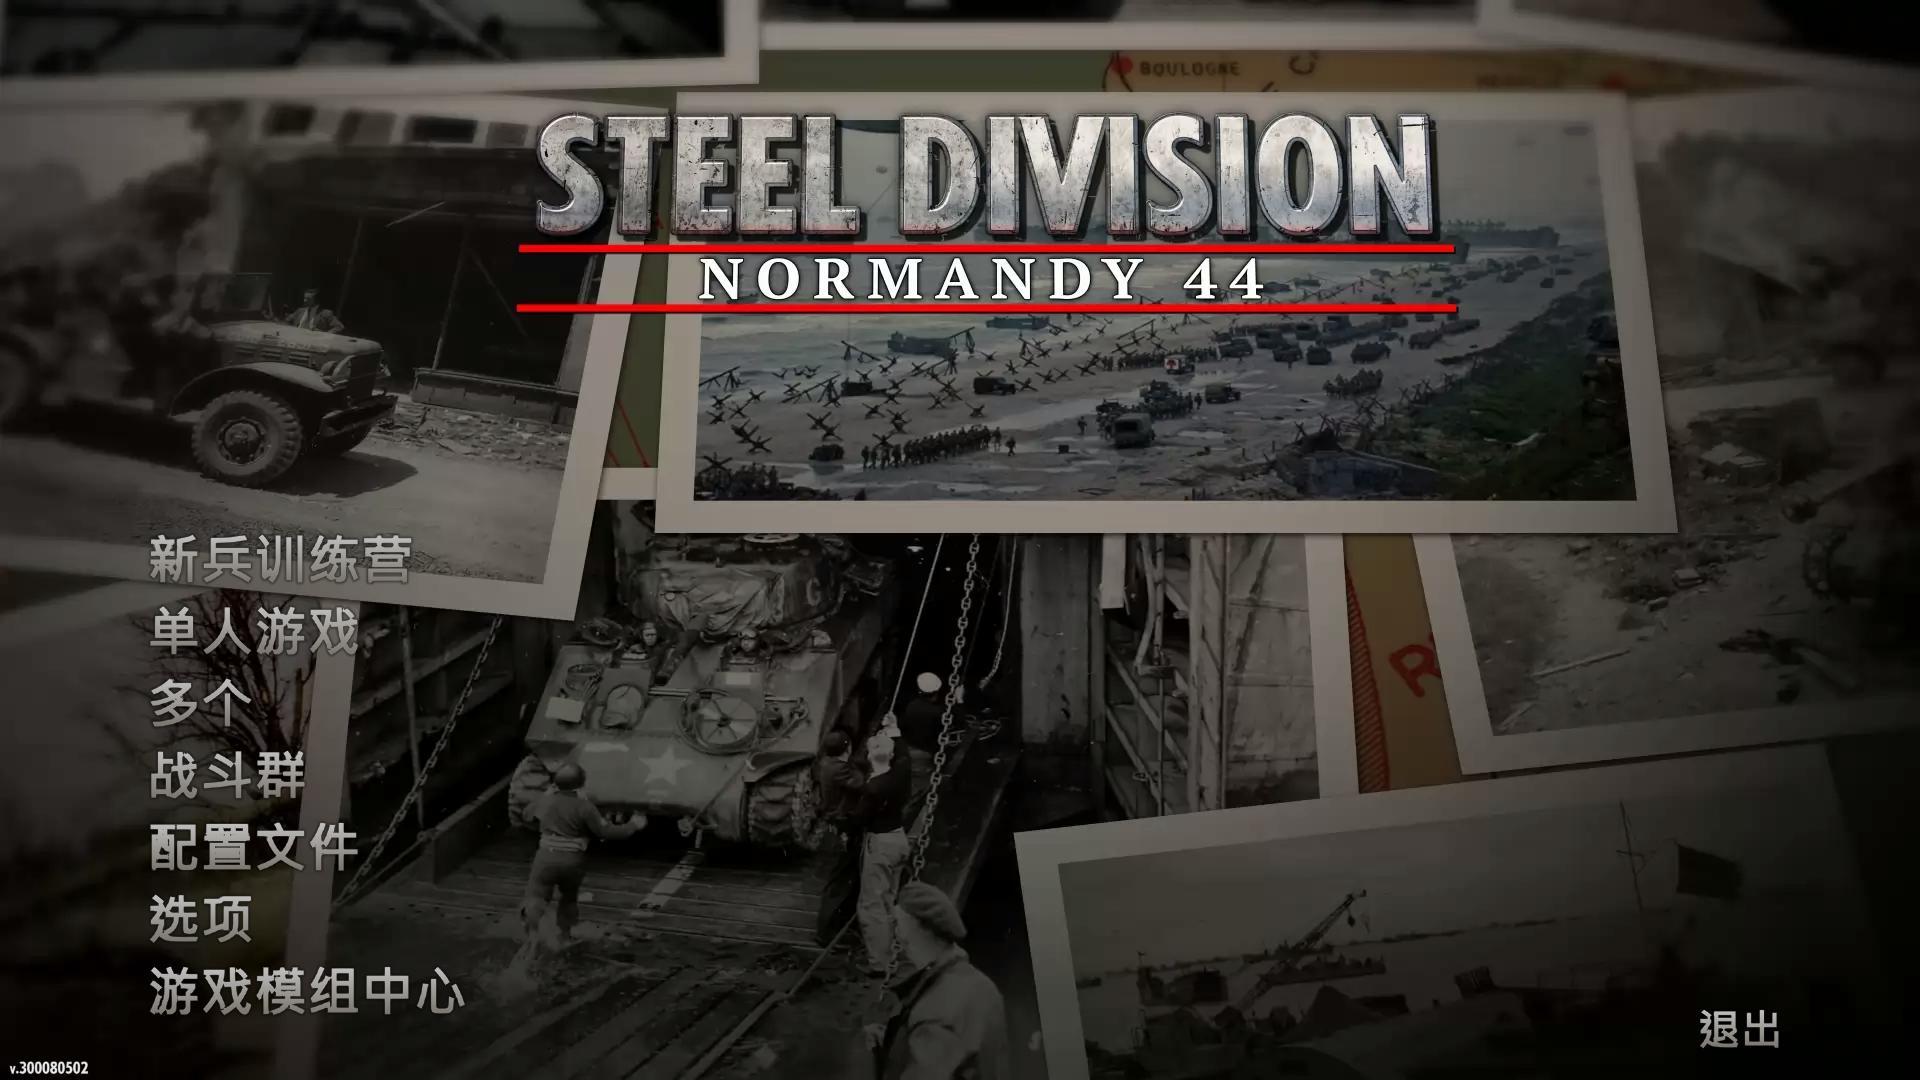 钢铁之师:诺曼底44(Steel Division: Normandy 44)免安装简体中文绿色版|DLC|升级档|网盘下载